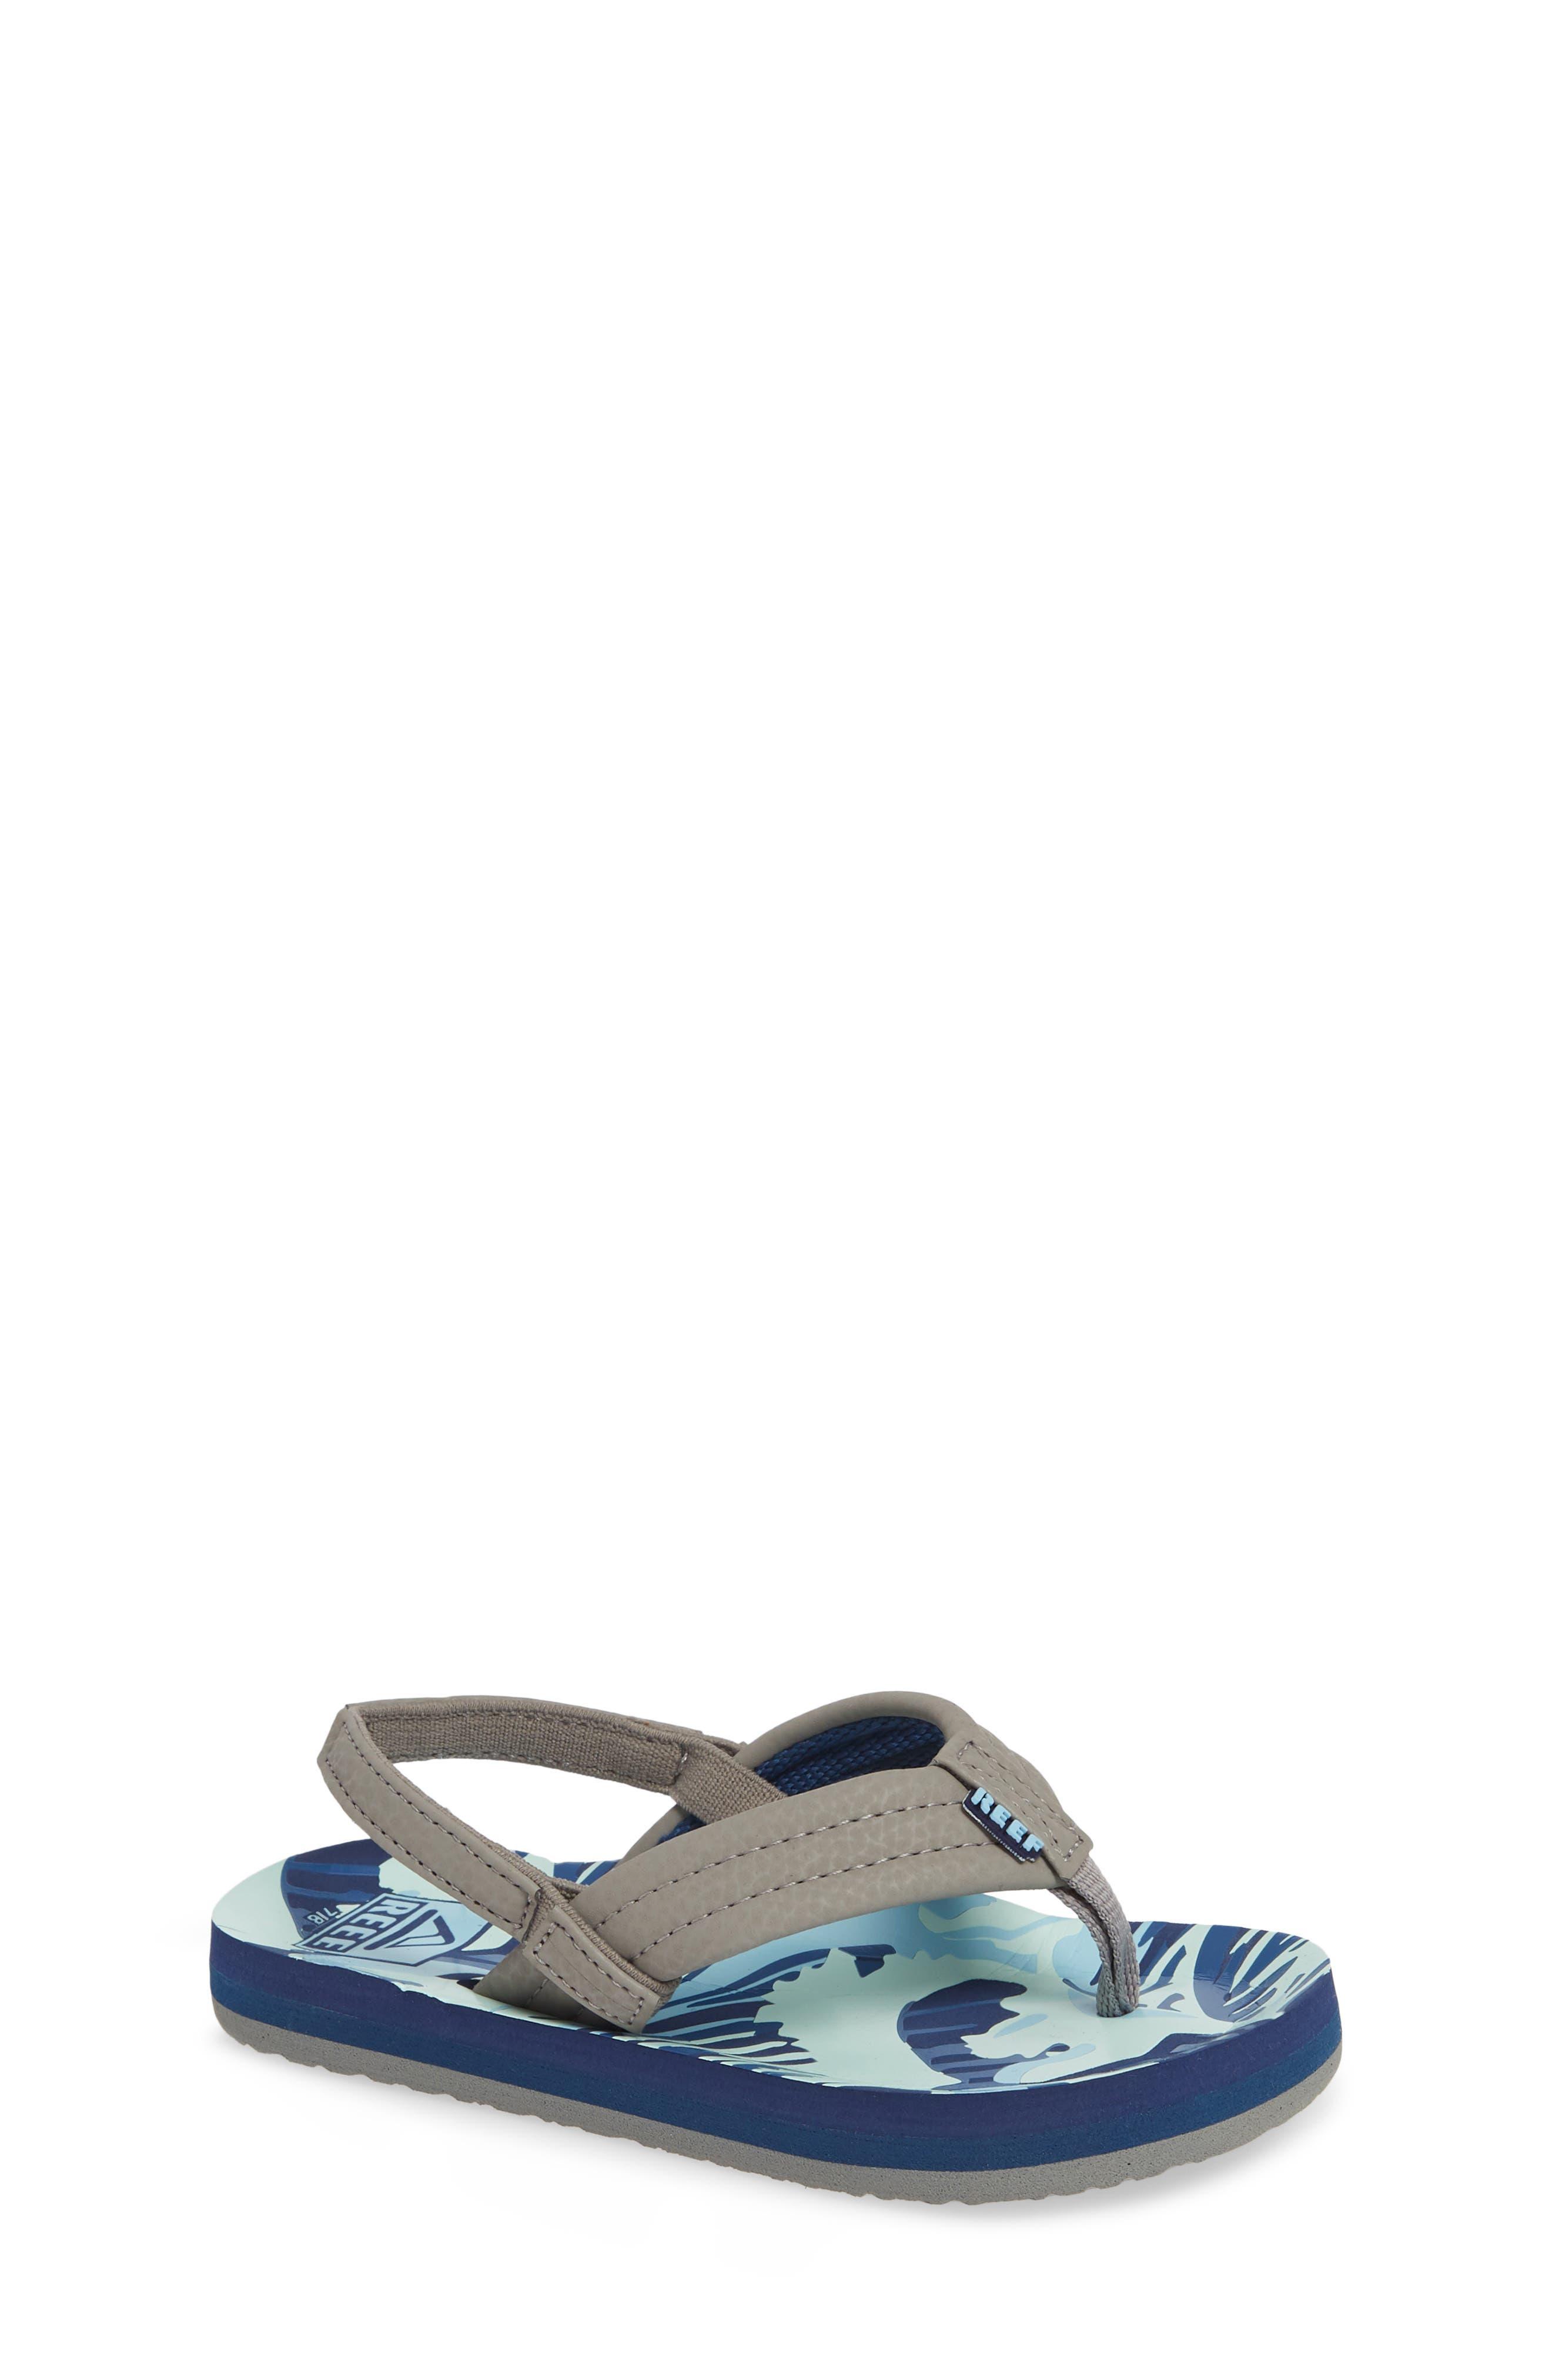 'Ahi' Sandal, Main, color, BLUE